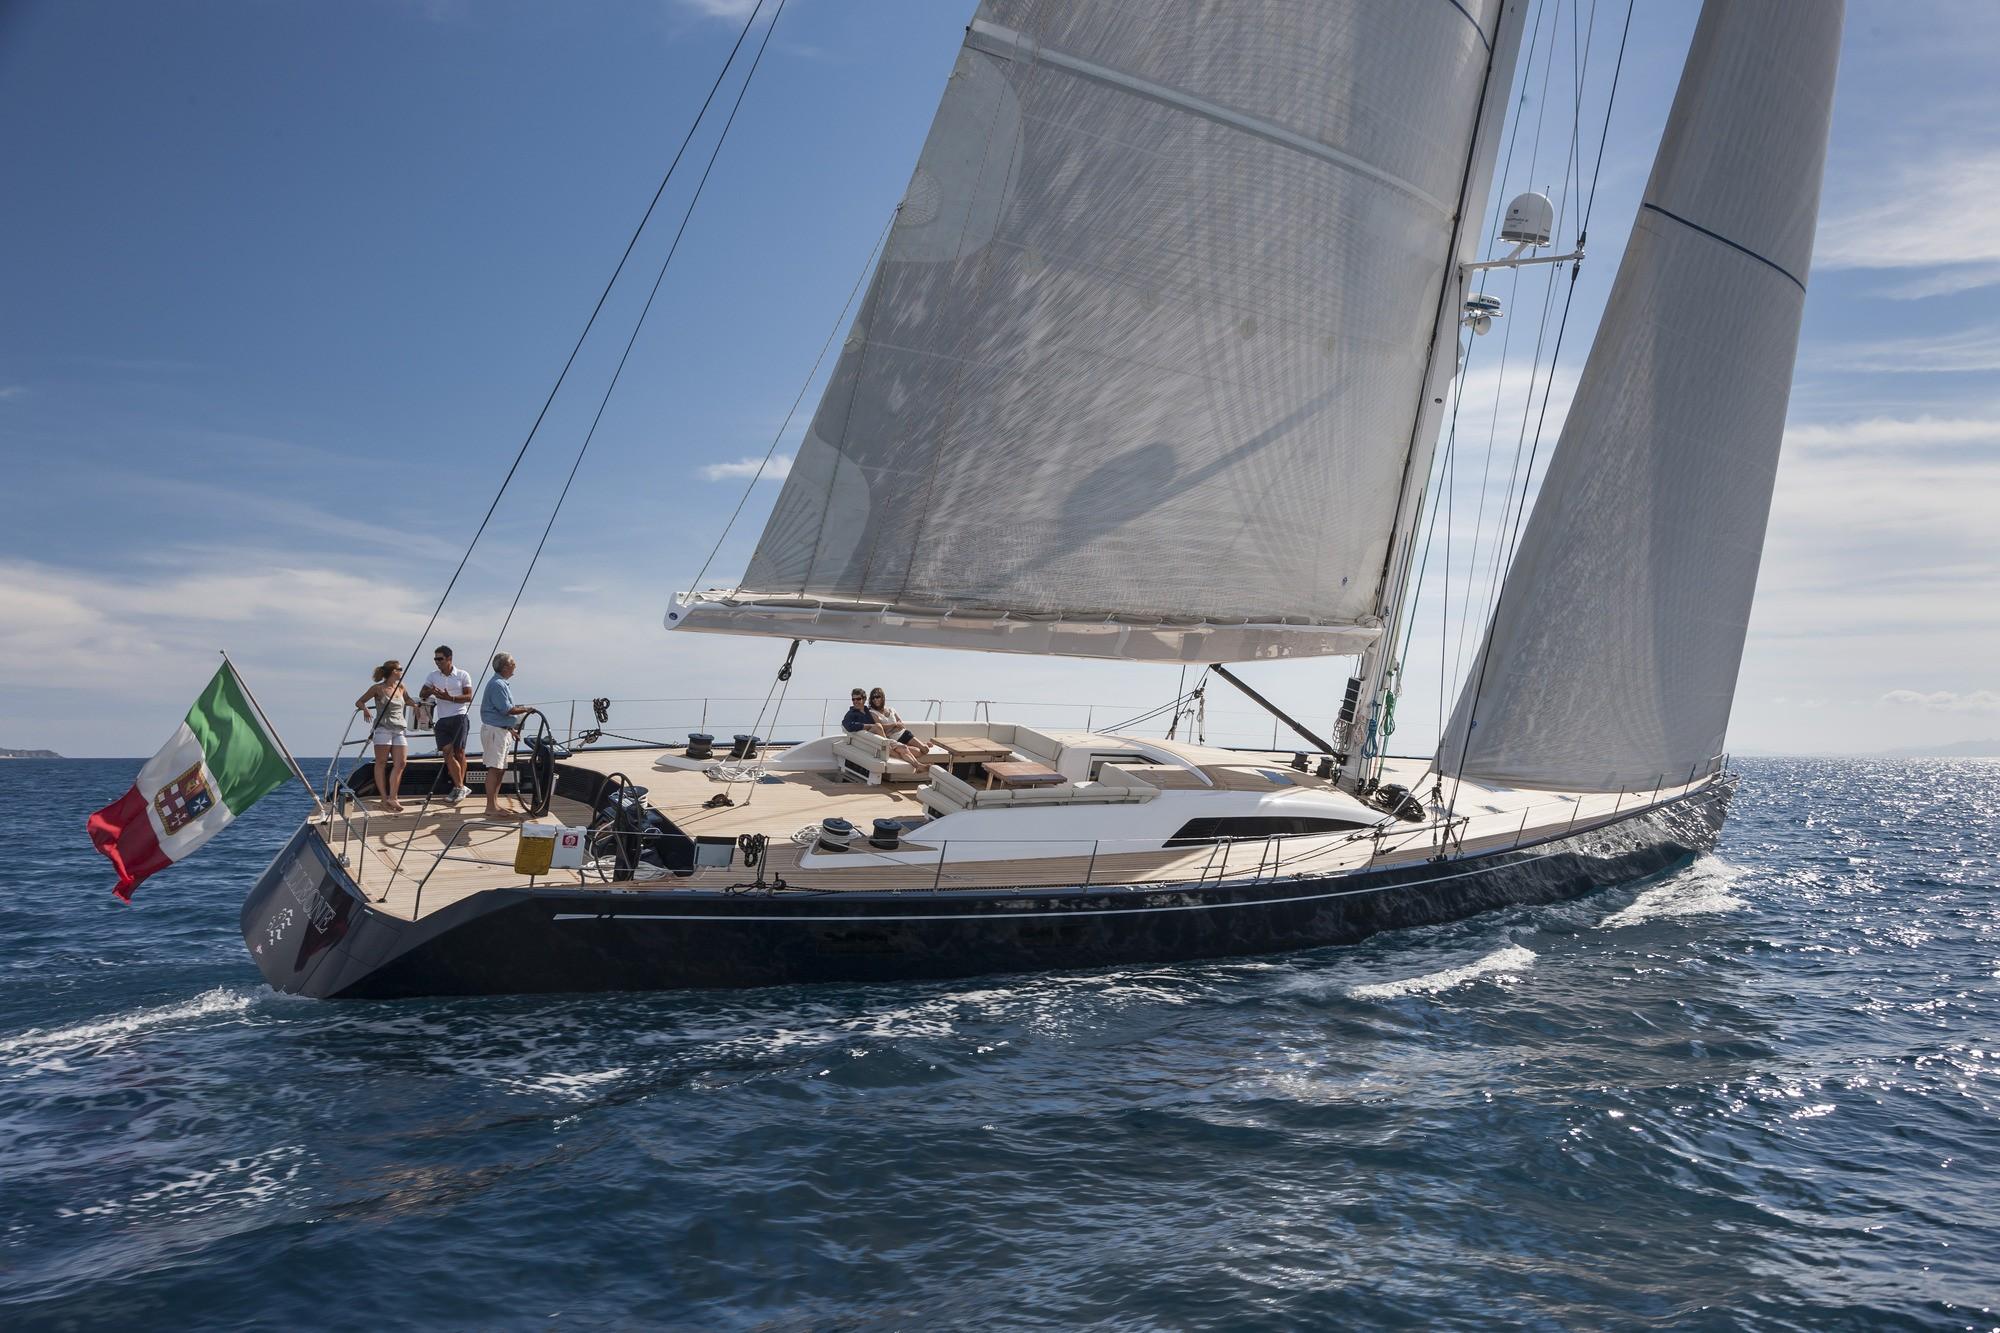 SOLLEONE III Yacht Charter Details Nautor Swan